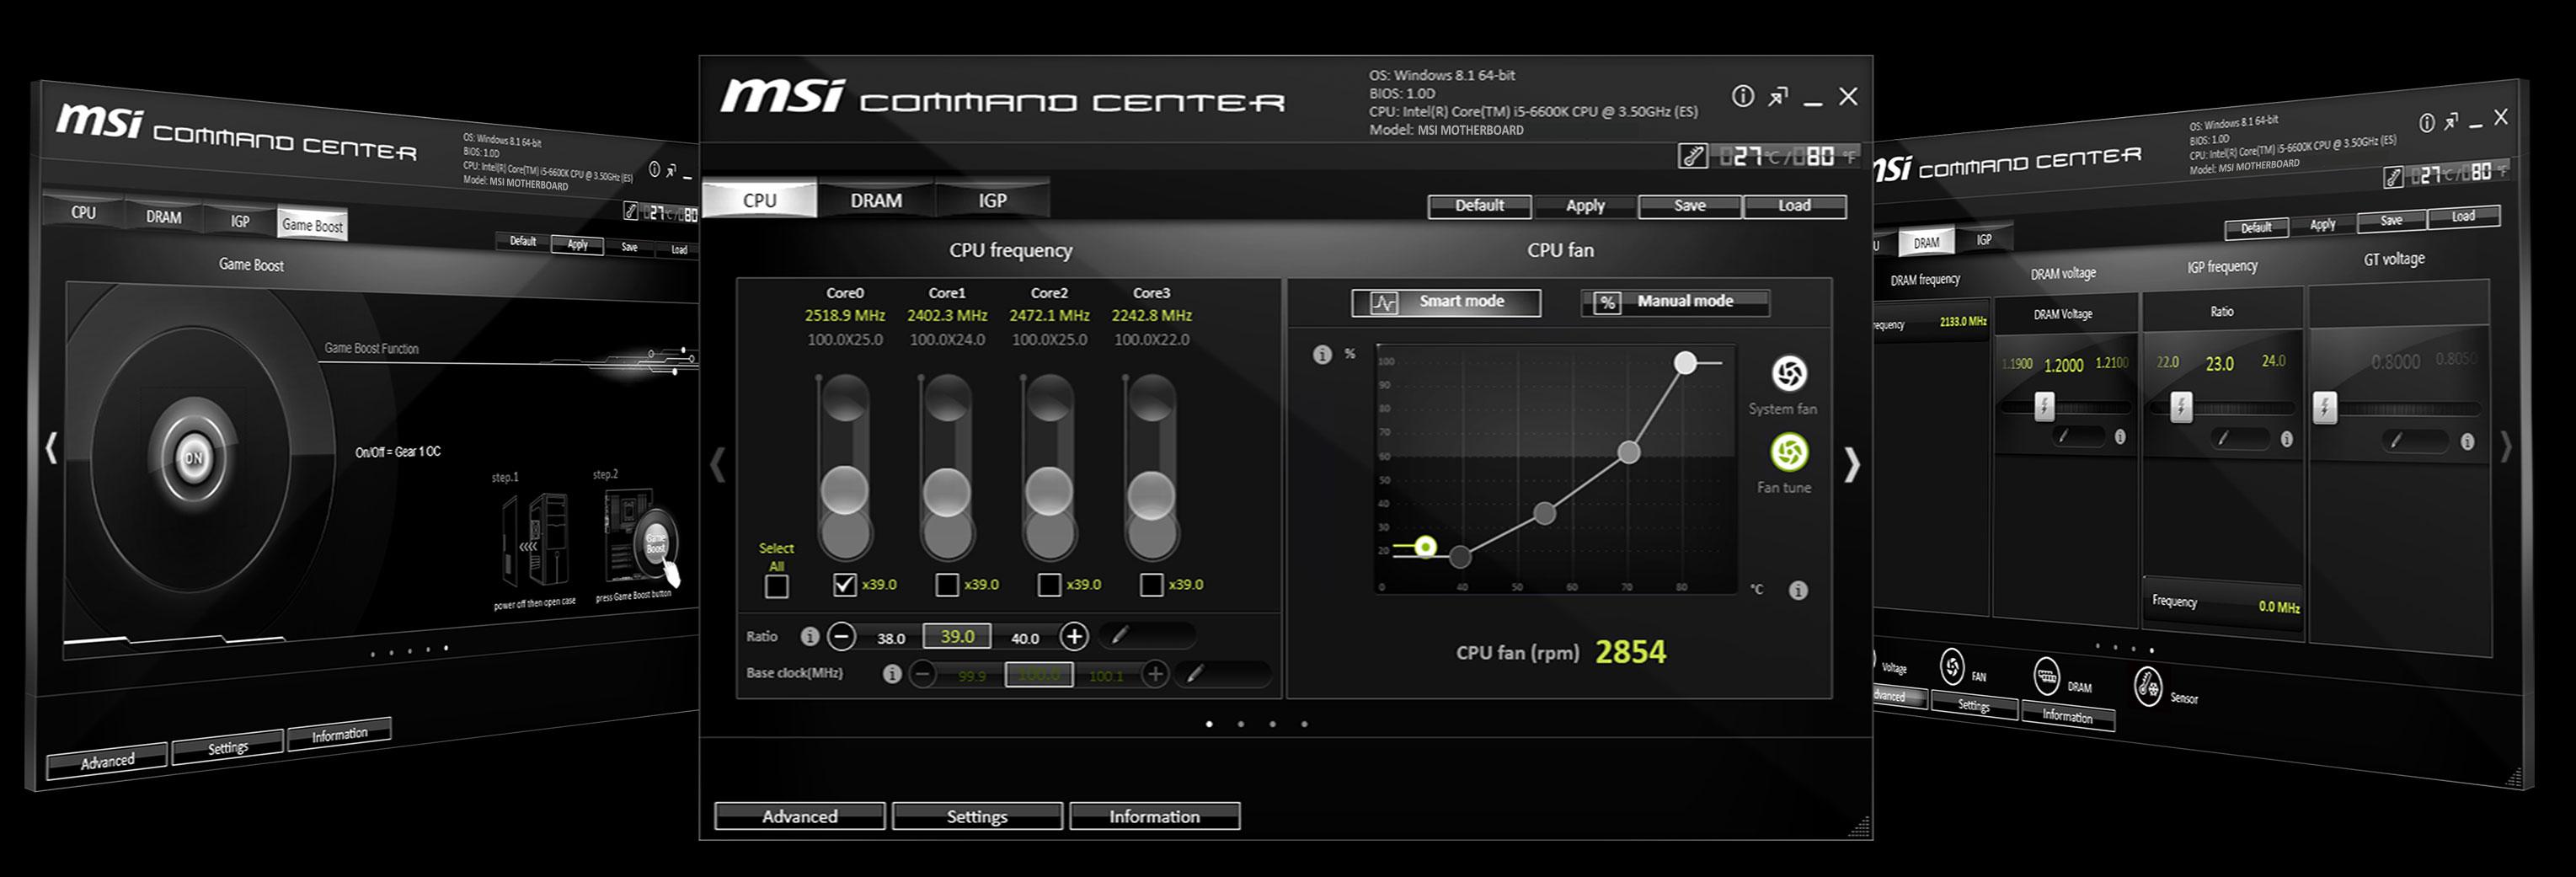 MSI B250M Pro-VH Socket LGA 1151 Gaming Motherboard | Help Tech Co  Ltd